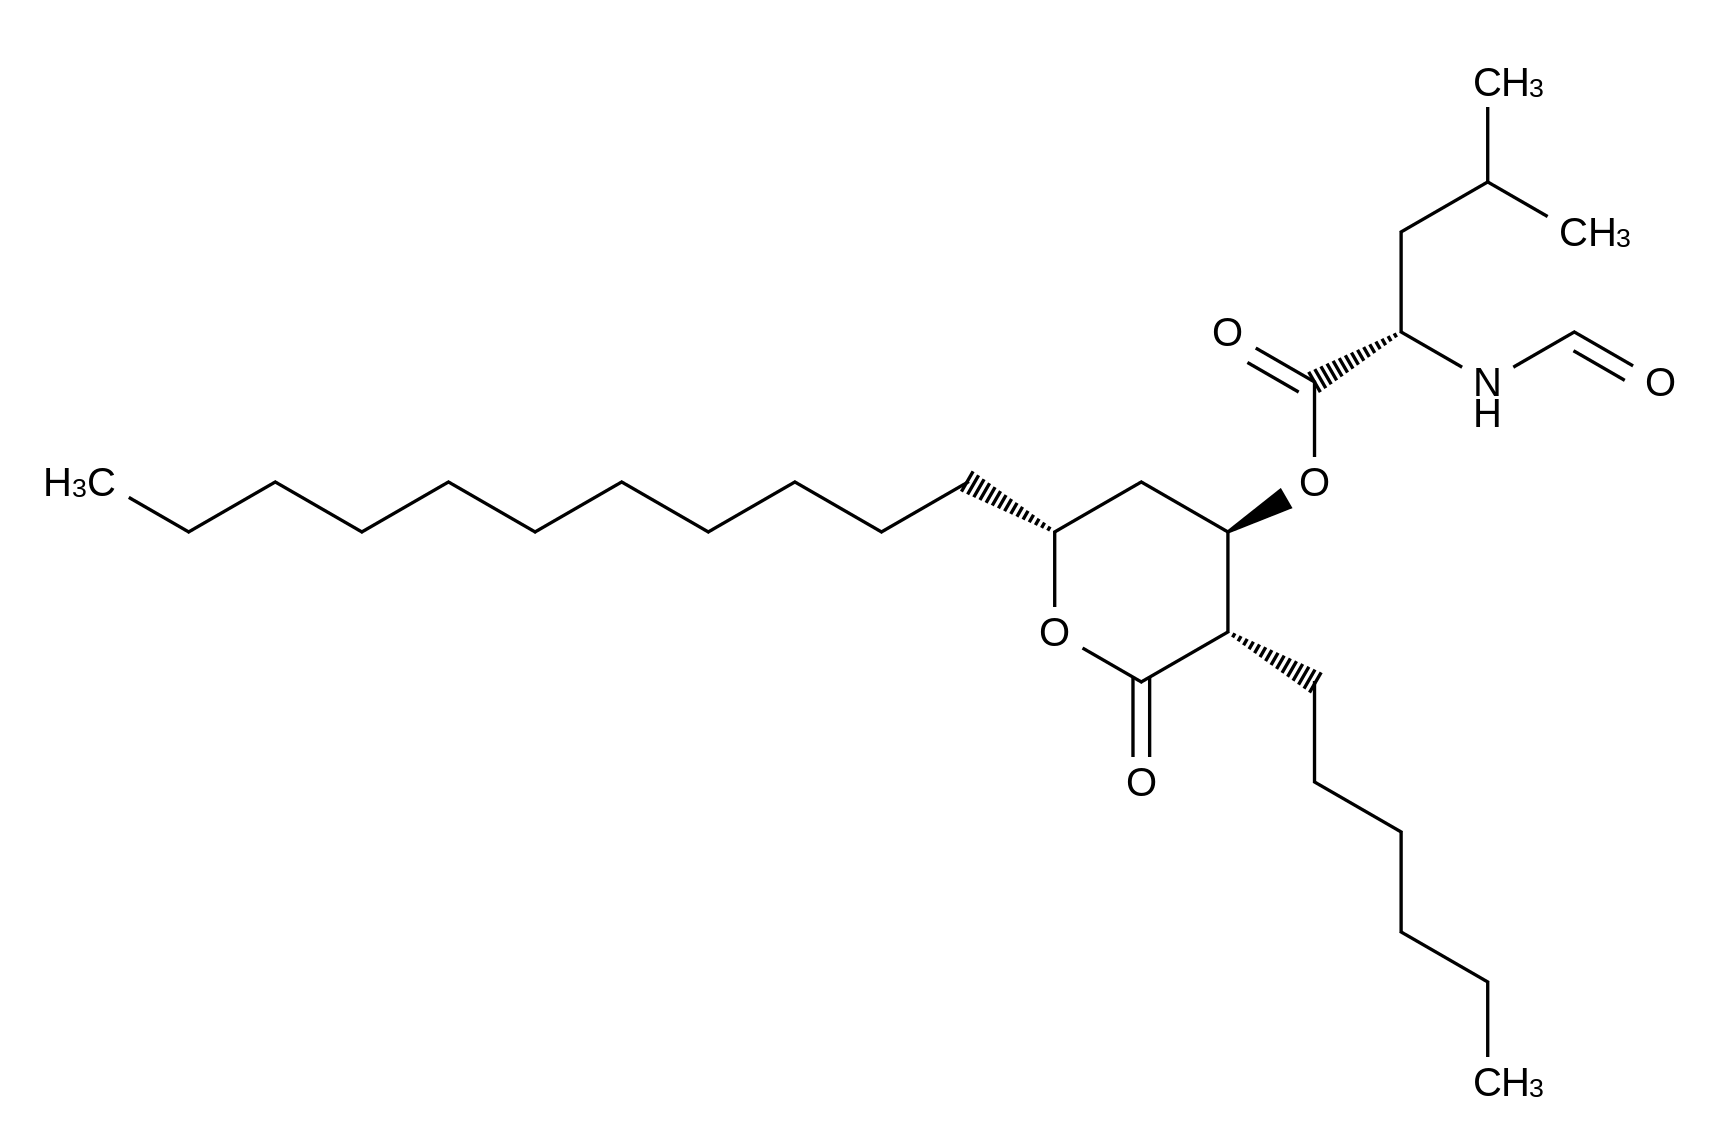 N-Formyl-L-leucine (3S,4R,6S)-3-Hexyltetrahydro-2-oxo-6-undecyl-2H-pyran-4-yl Ester